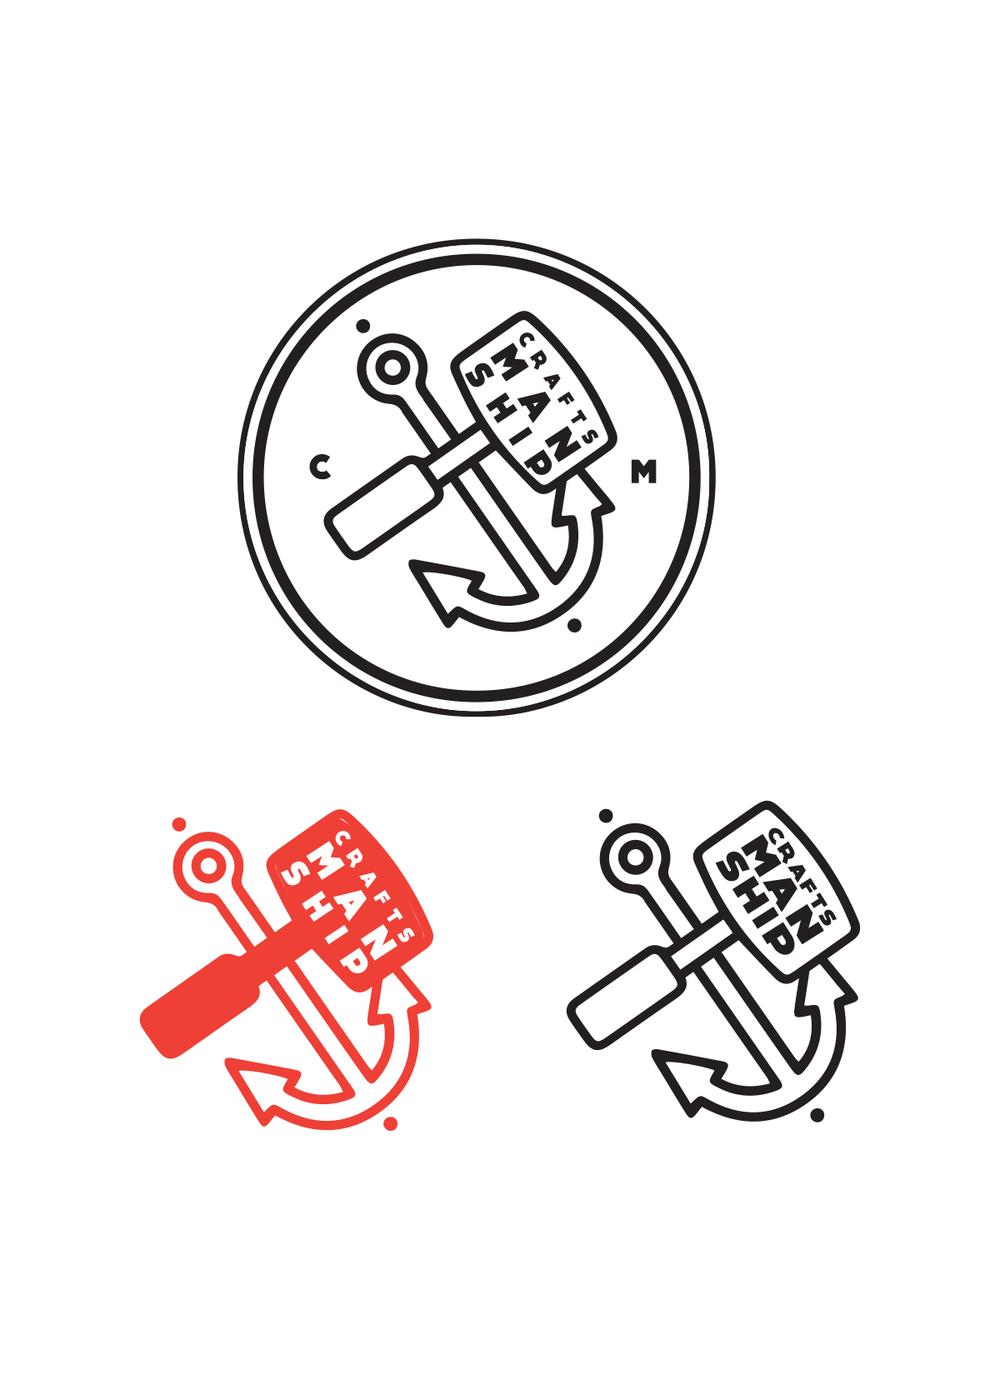 CMS_logos9.jpg